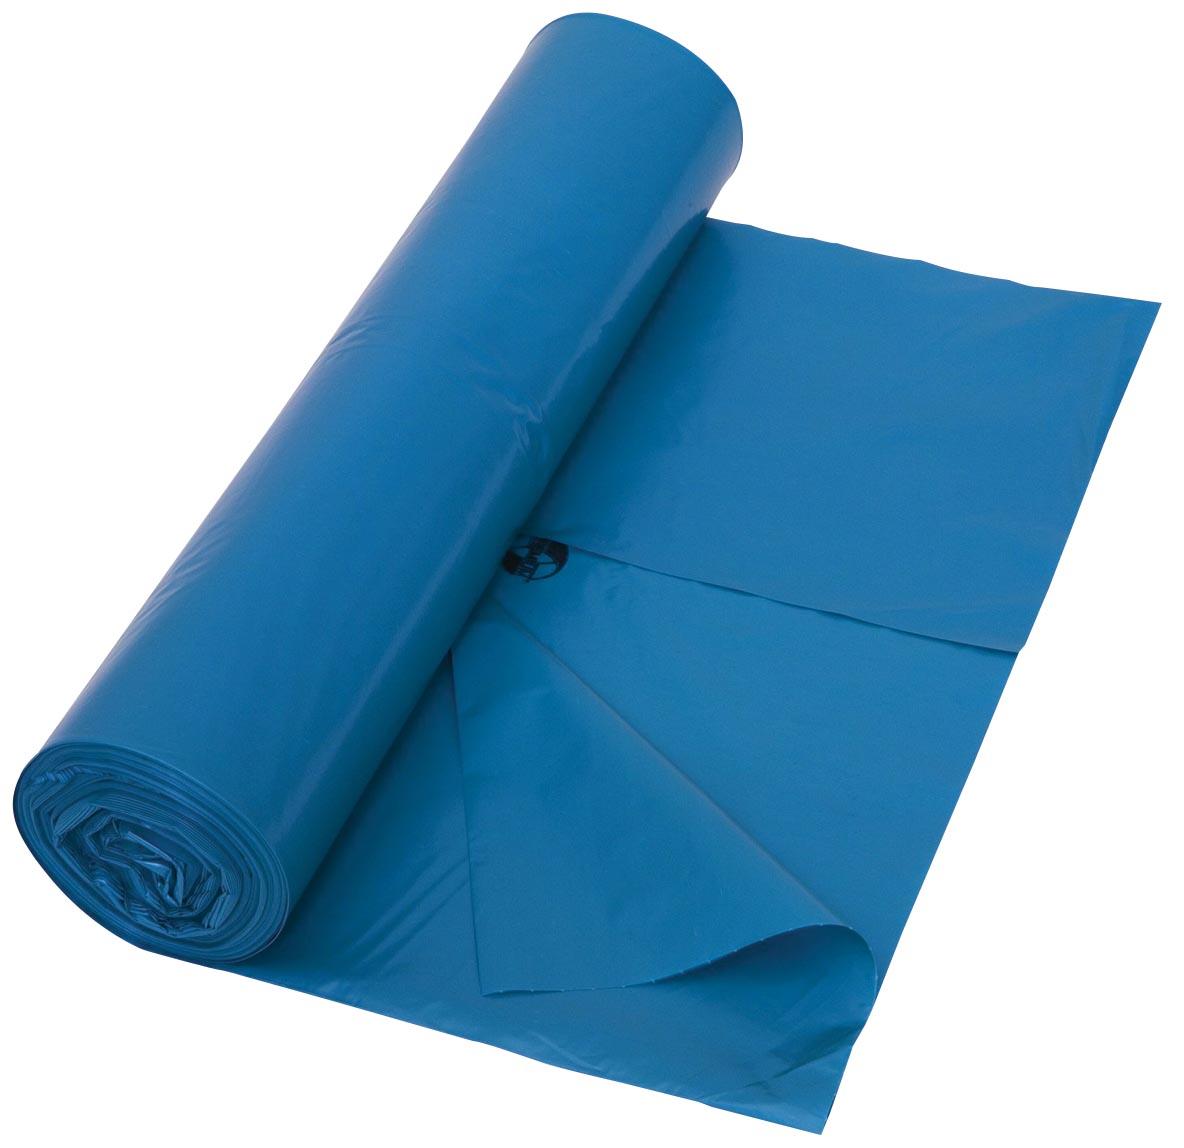 Vuilniszak 45 micron, ft 80 x 100 cm, blauw, rol van 25 stuks